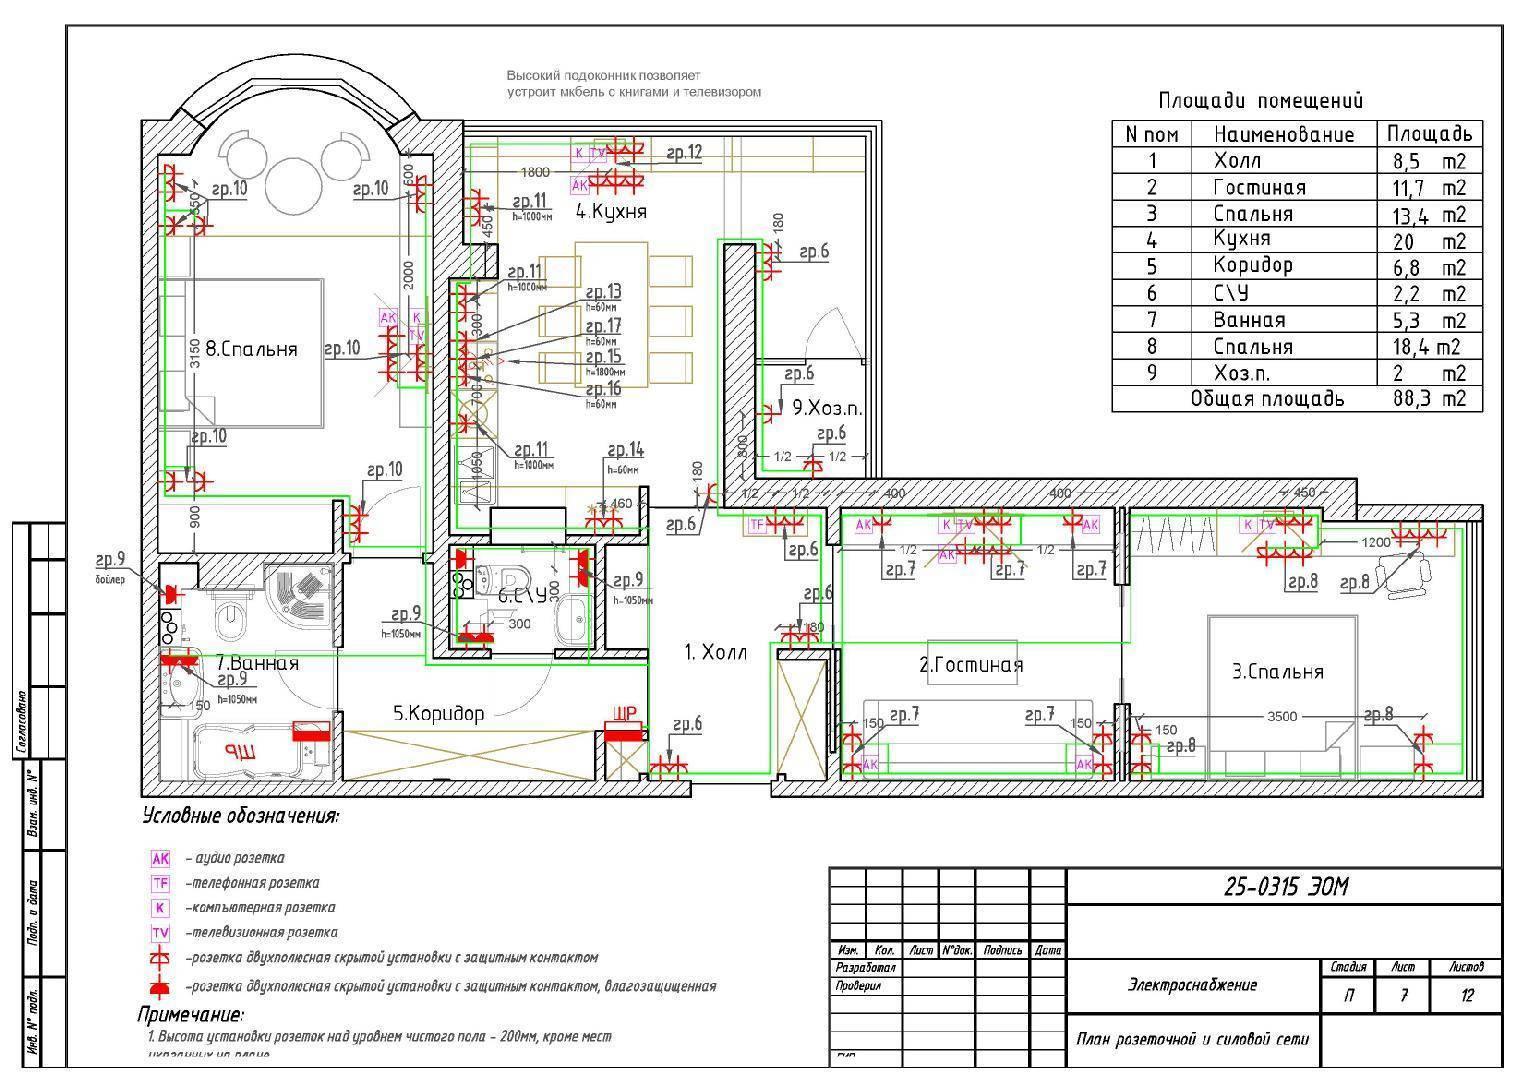 Электропроводка в квартире своими руками - схема и монтаж, фото